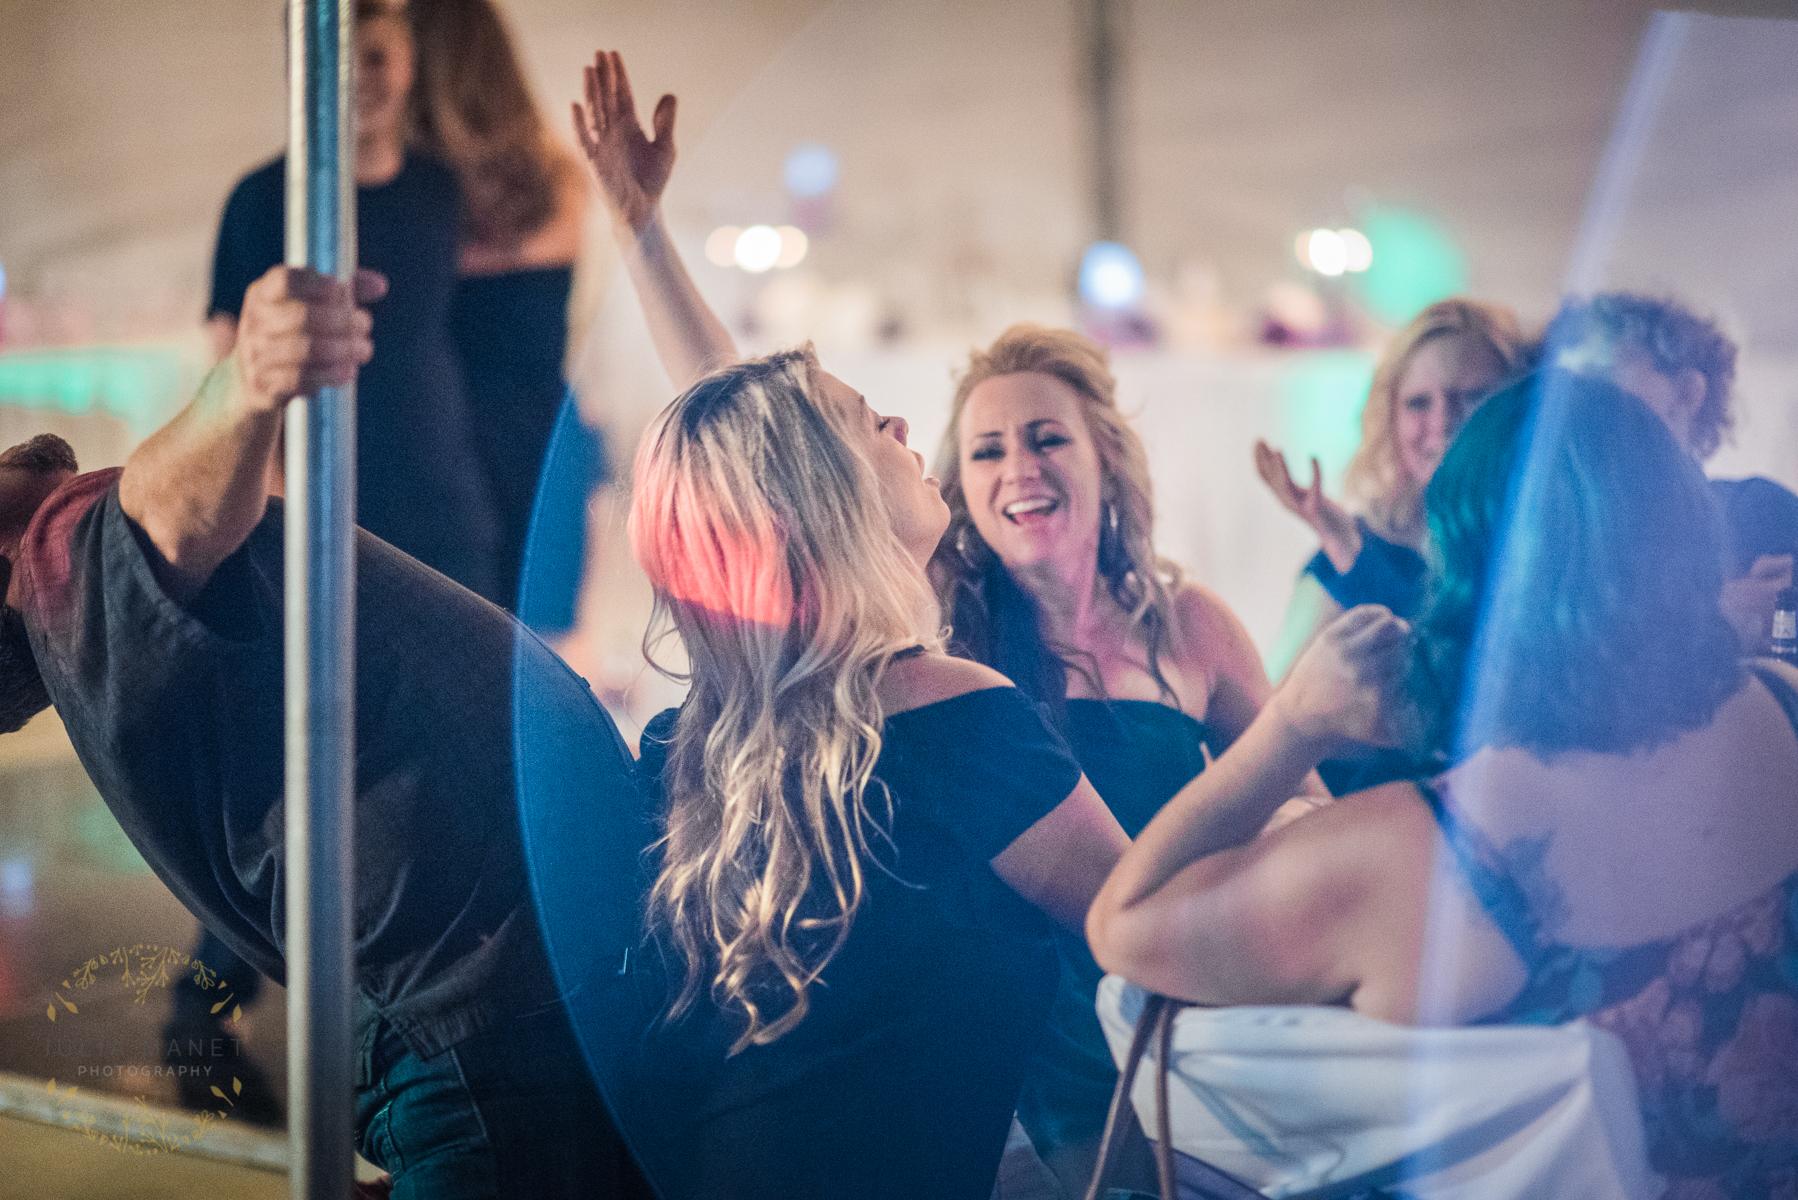 Bohemian Rhapsody plays during wedding reception at Julieanna's Patio Cafe in Yuma